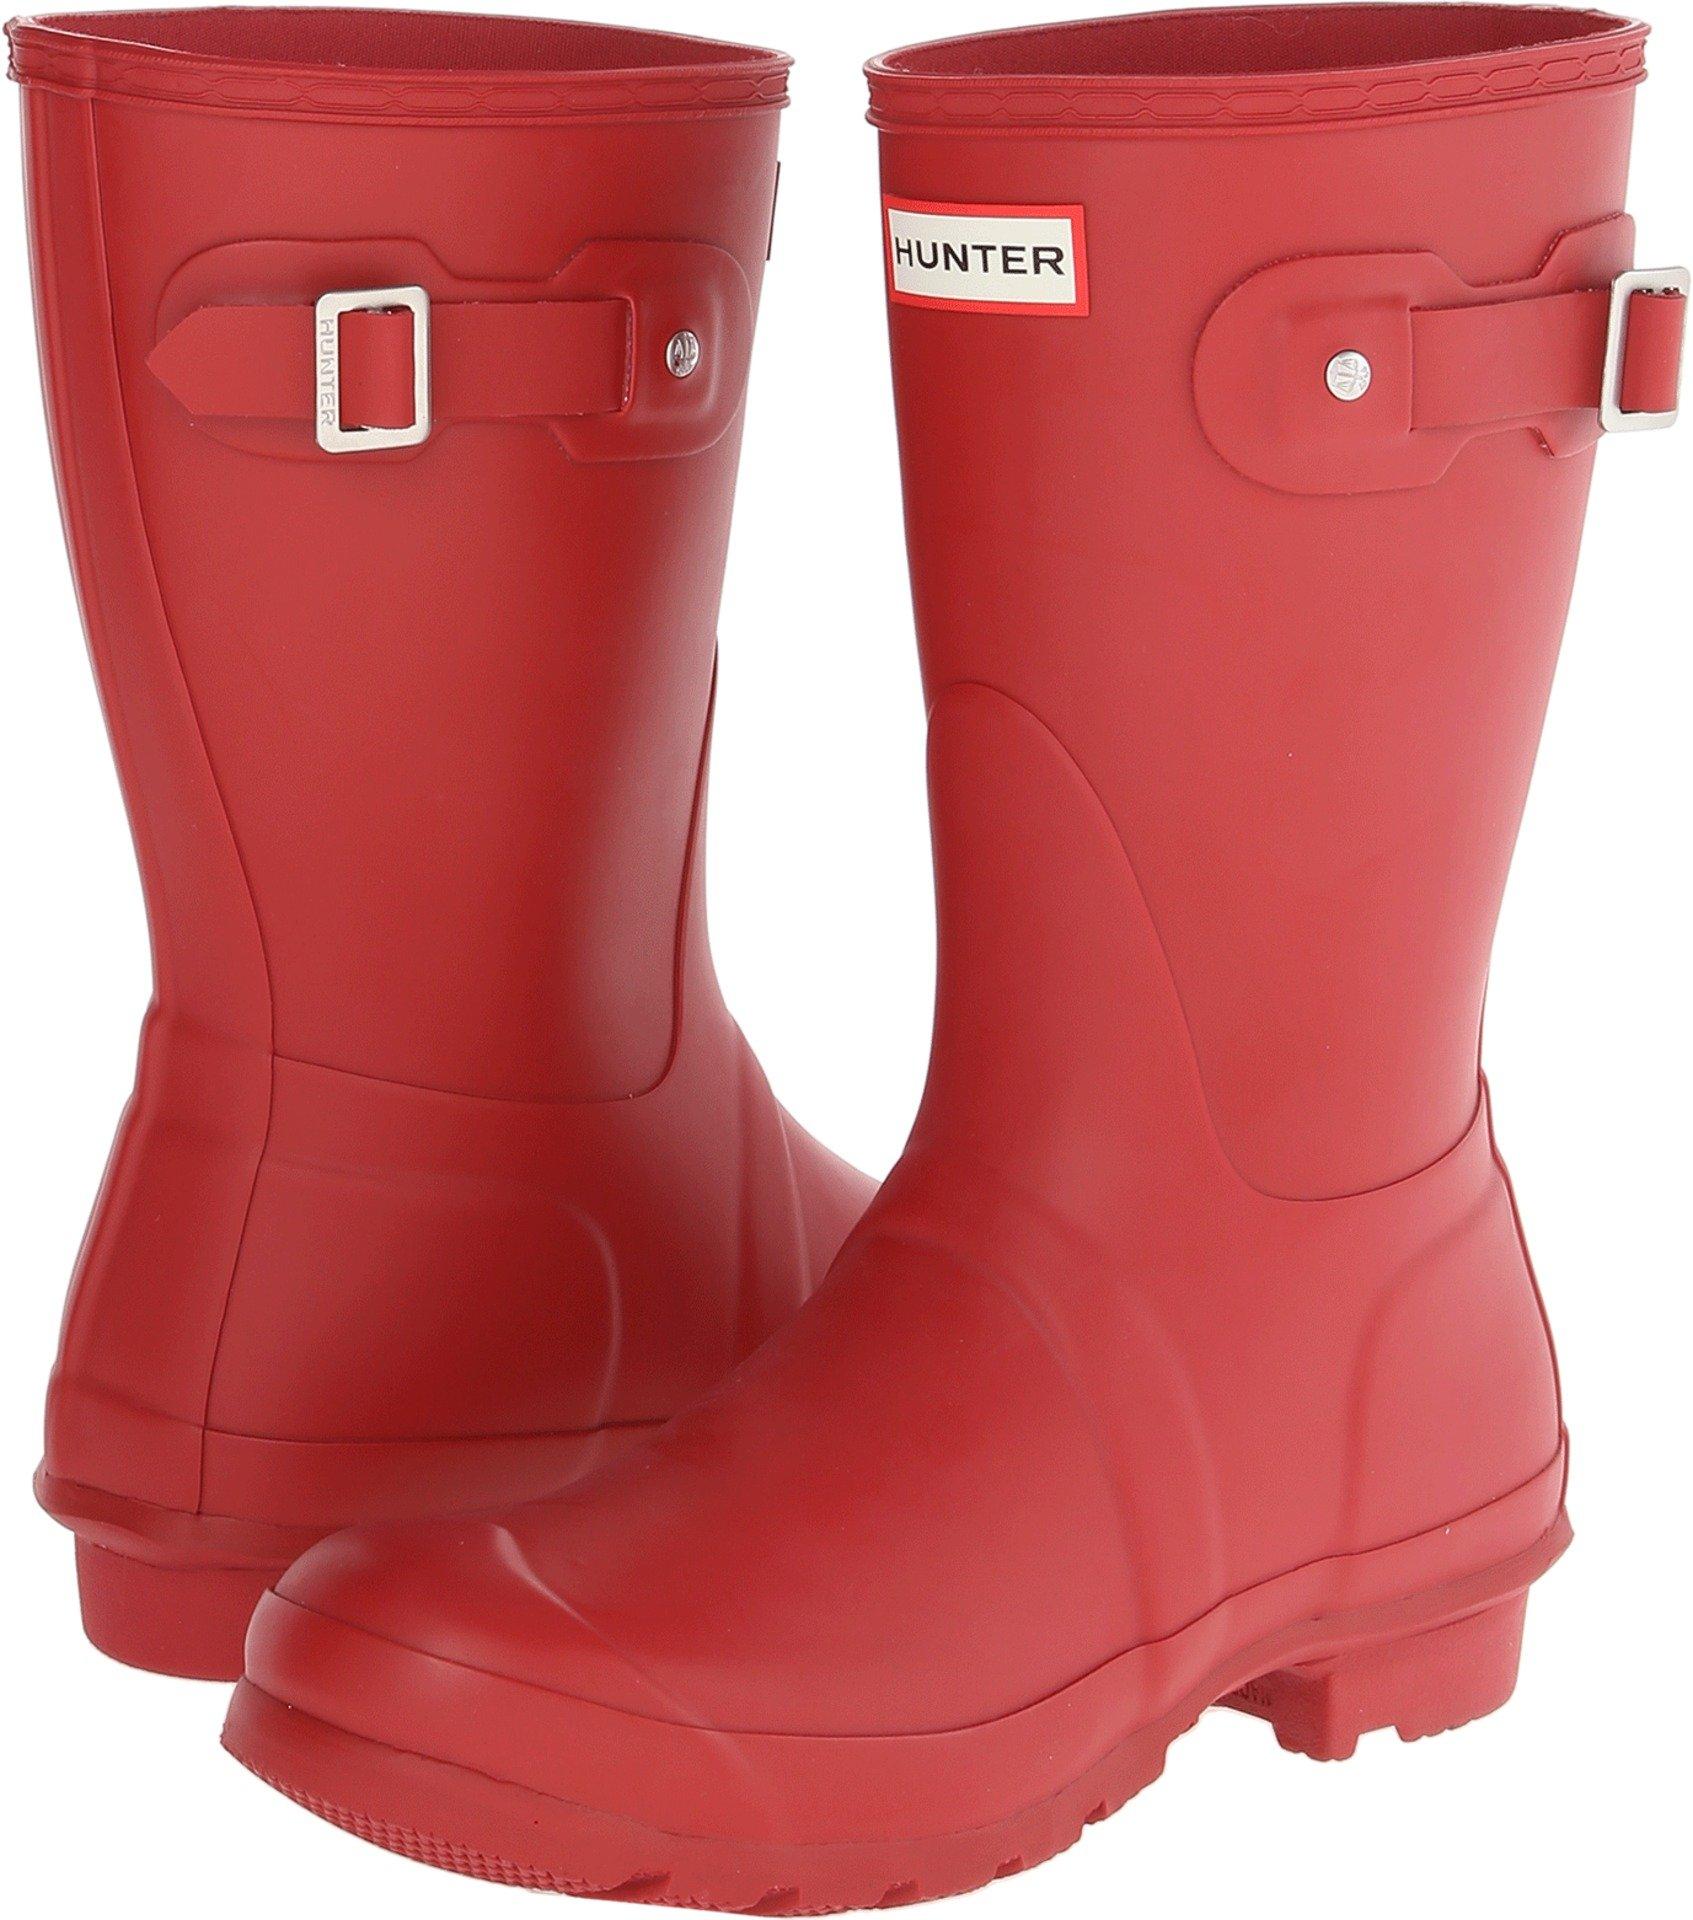 Hunter Womens Original Short Military Red Rain Boot - 9 B(M) US